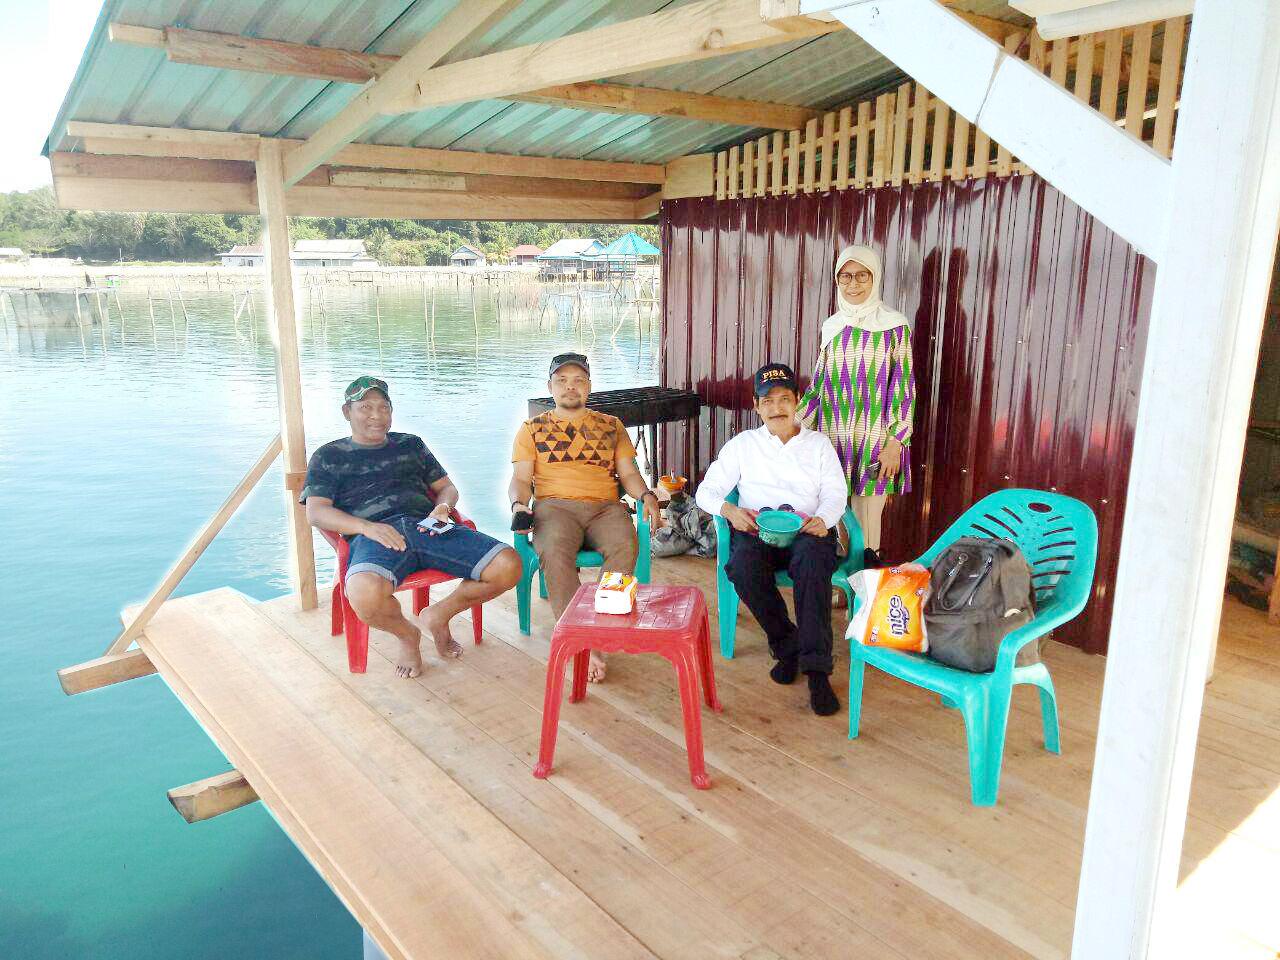 Napak Tilas Mengenang Masa Kecil Melintasi Laut ke Kampung Halaman